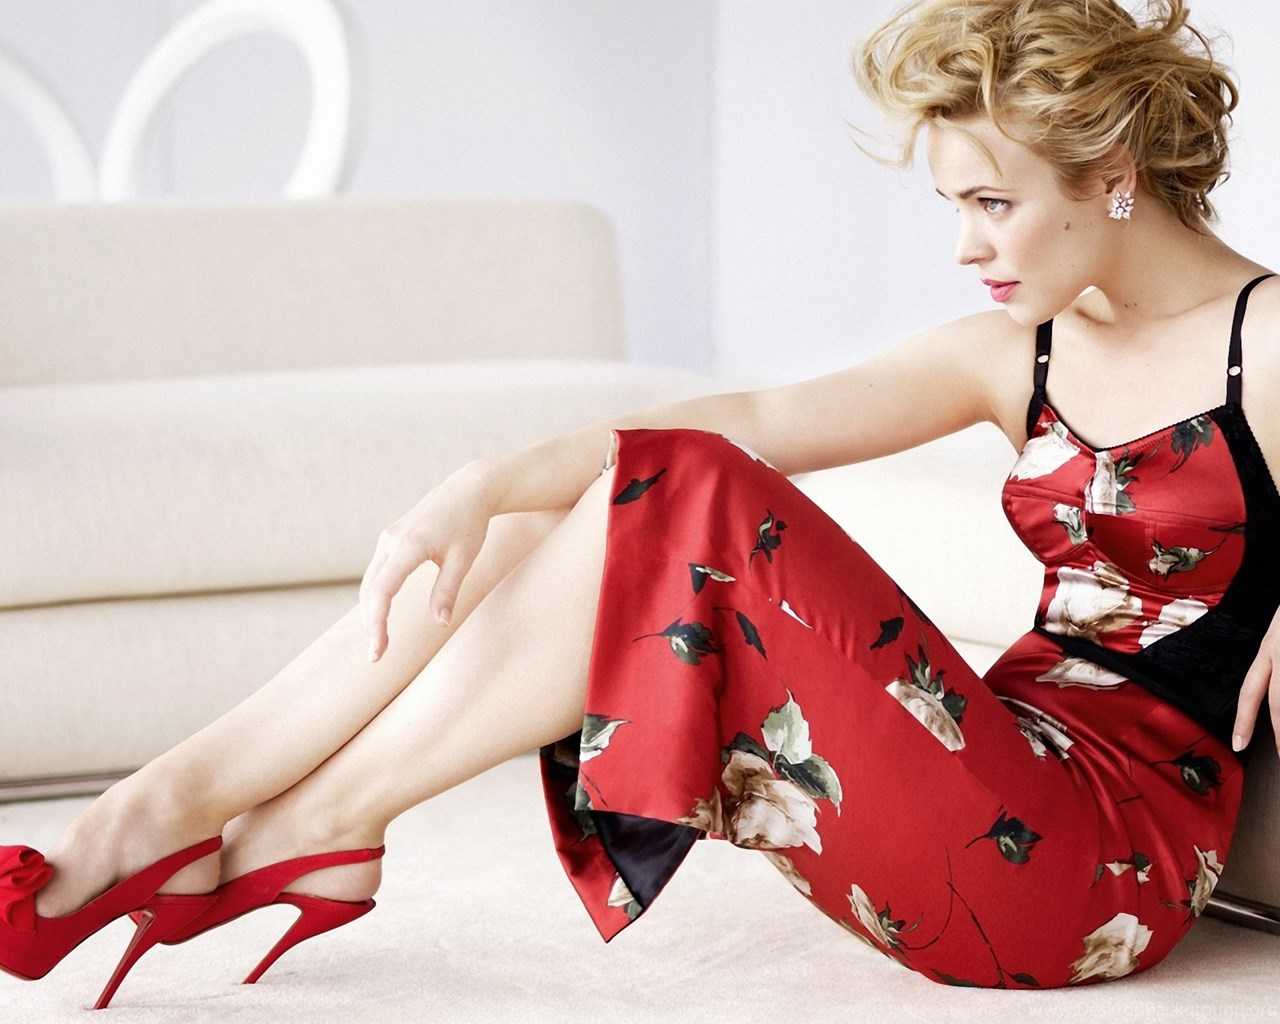 Keira Knightley For Coco Chanel HD Wallpapers 4K Desktop